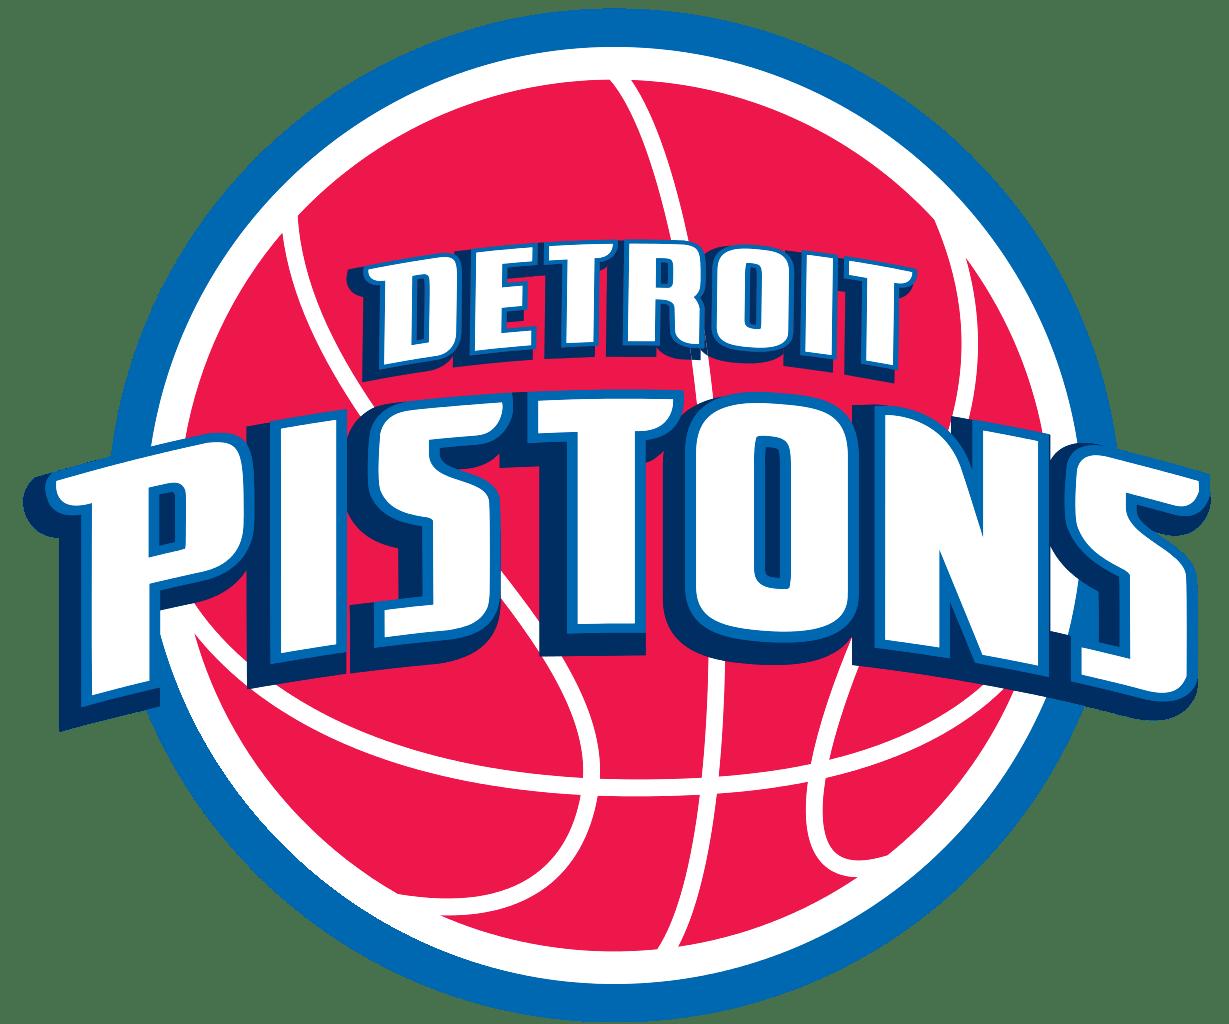 Piston basketball clipart jpg black and white stock Detroit Pistons Logo transparent PNG - StickPNG jpg black and white stock